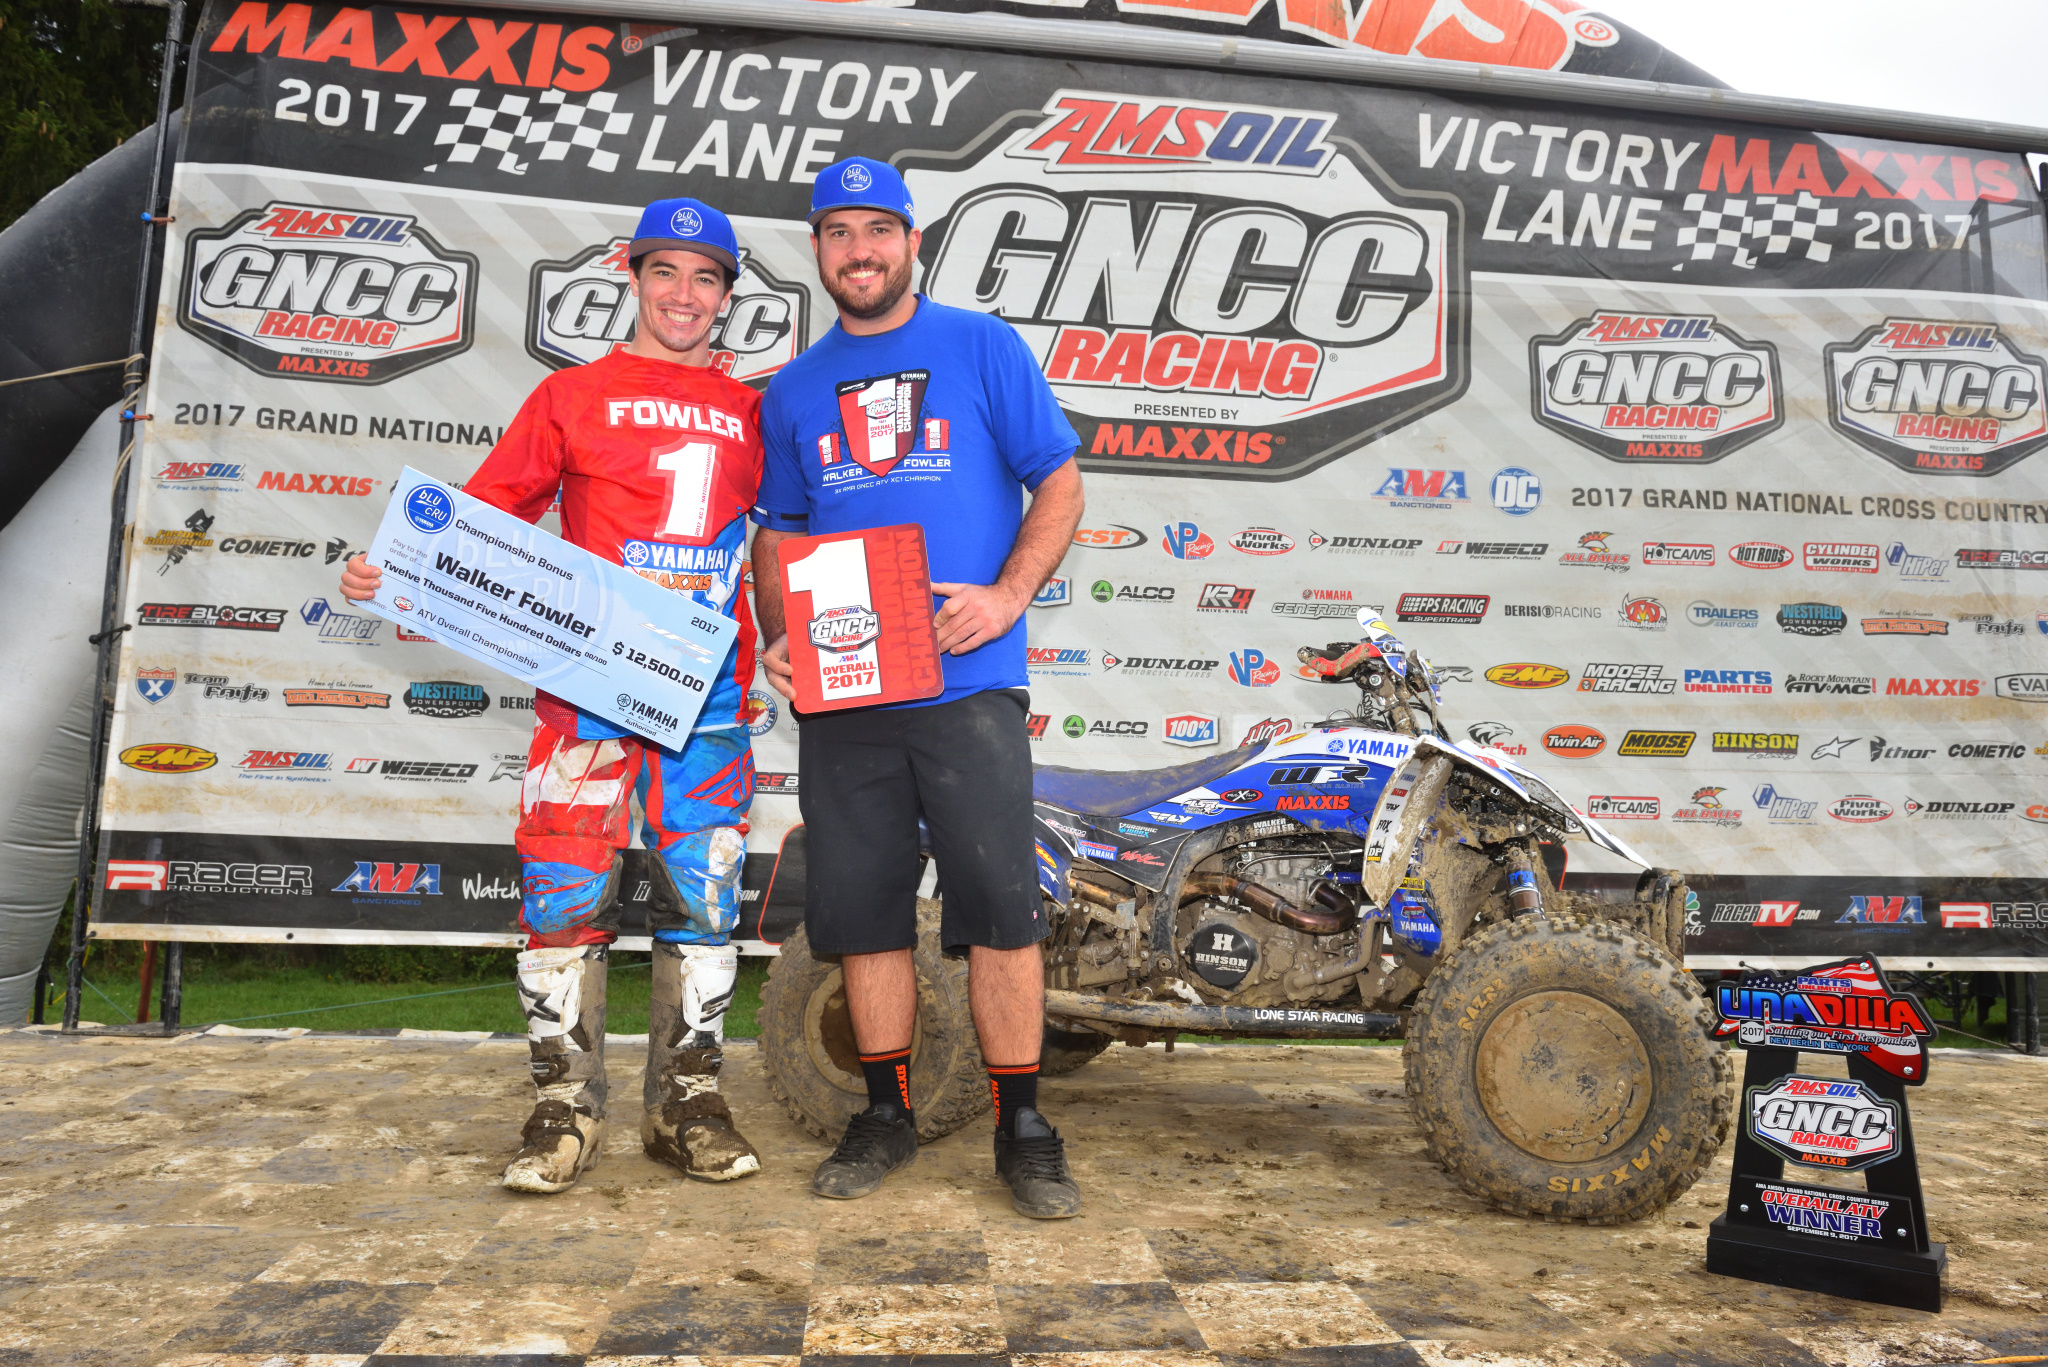 Yamaha's Walker Fowler Takes 2017 GNCC Championship